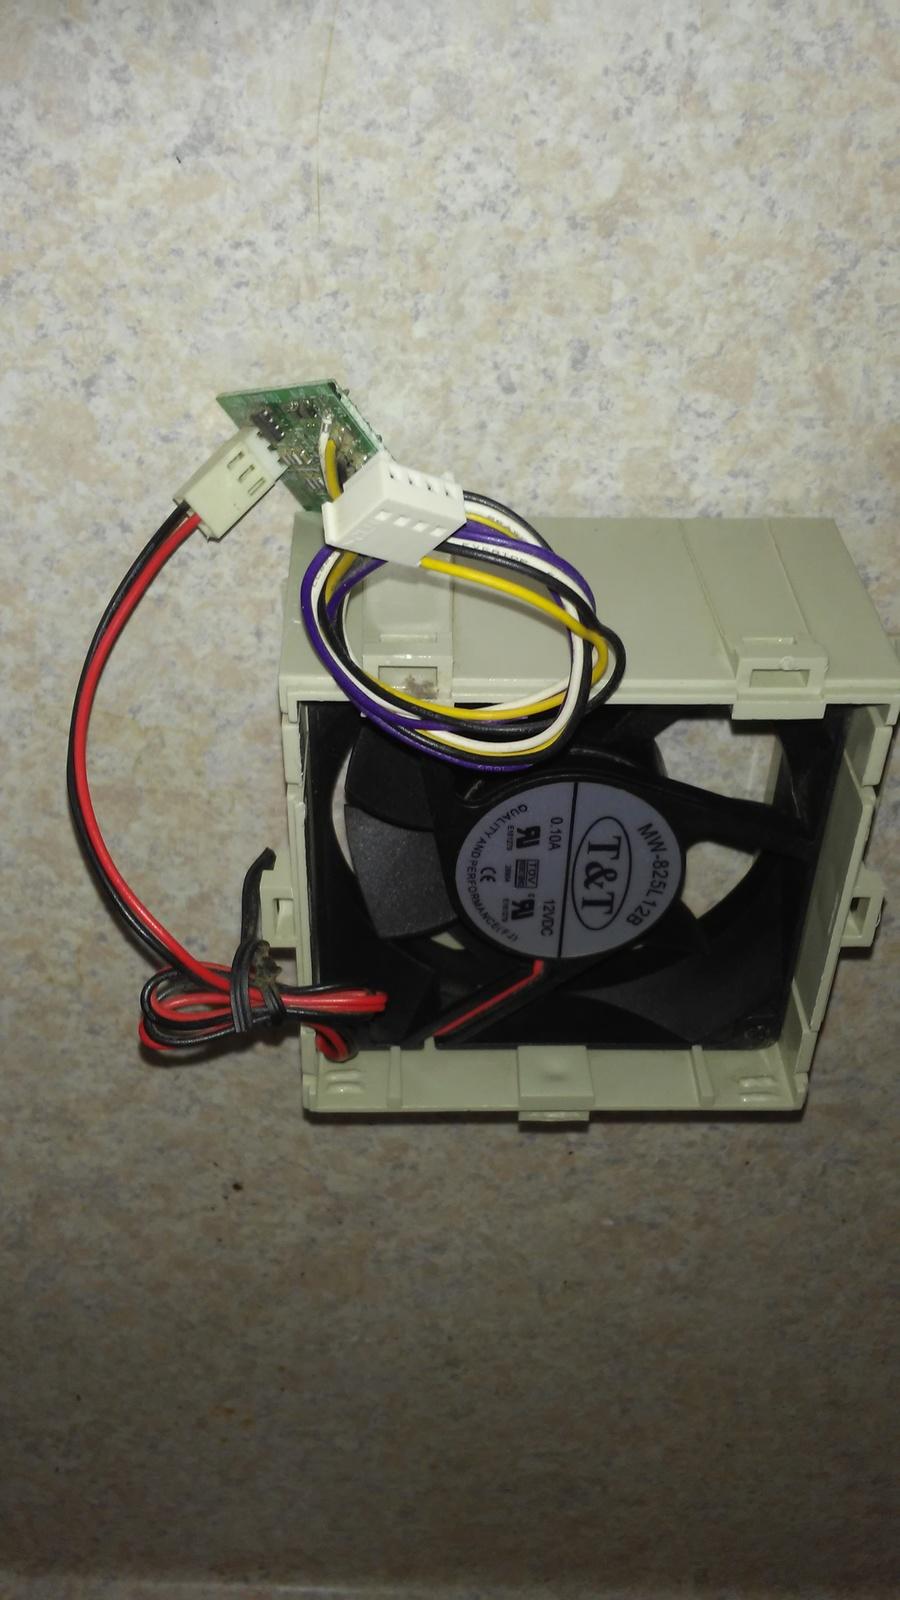 HP 468628-001 Z600 Memory Fan and Shroud Assembly